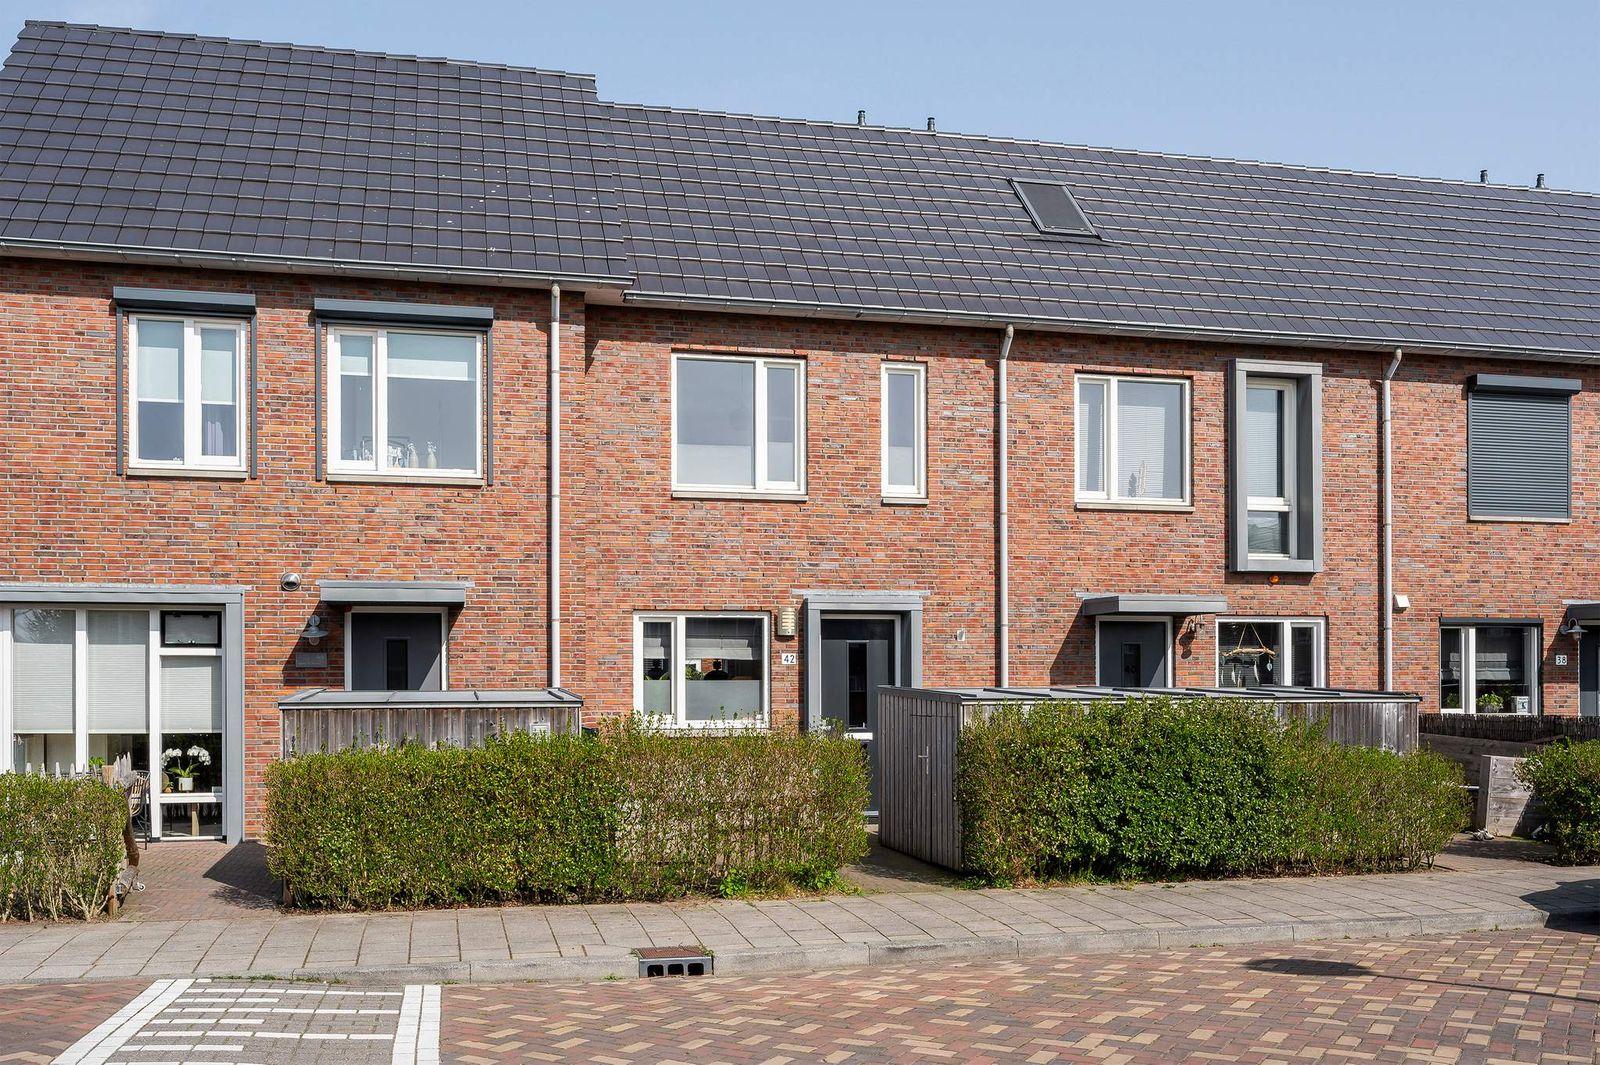 Van Innevelthof 42, Maasdijk